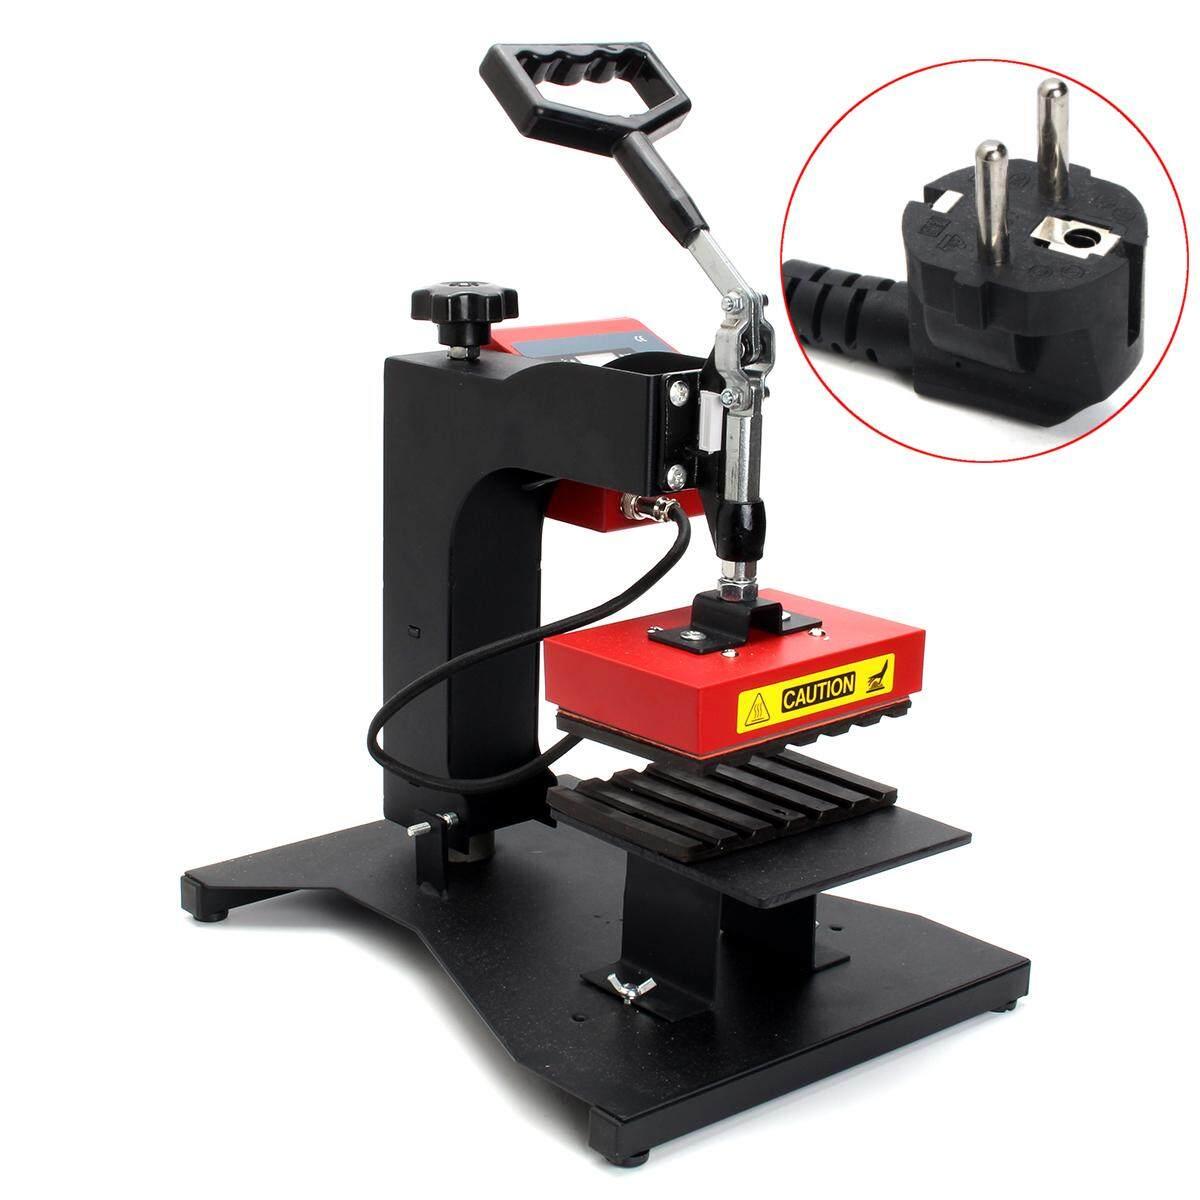 6 Pcs Digital Pen Heat Press Machine For Pen Heat Transfer Printing220v(eu Plug) - Intl By Freebang.